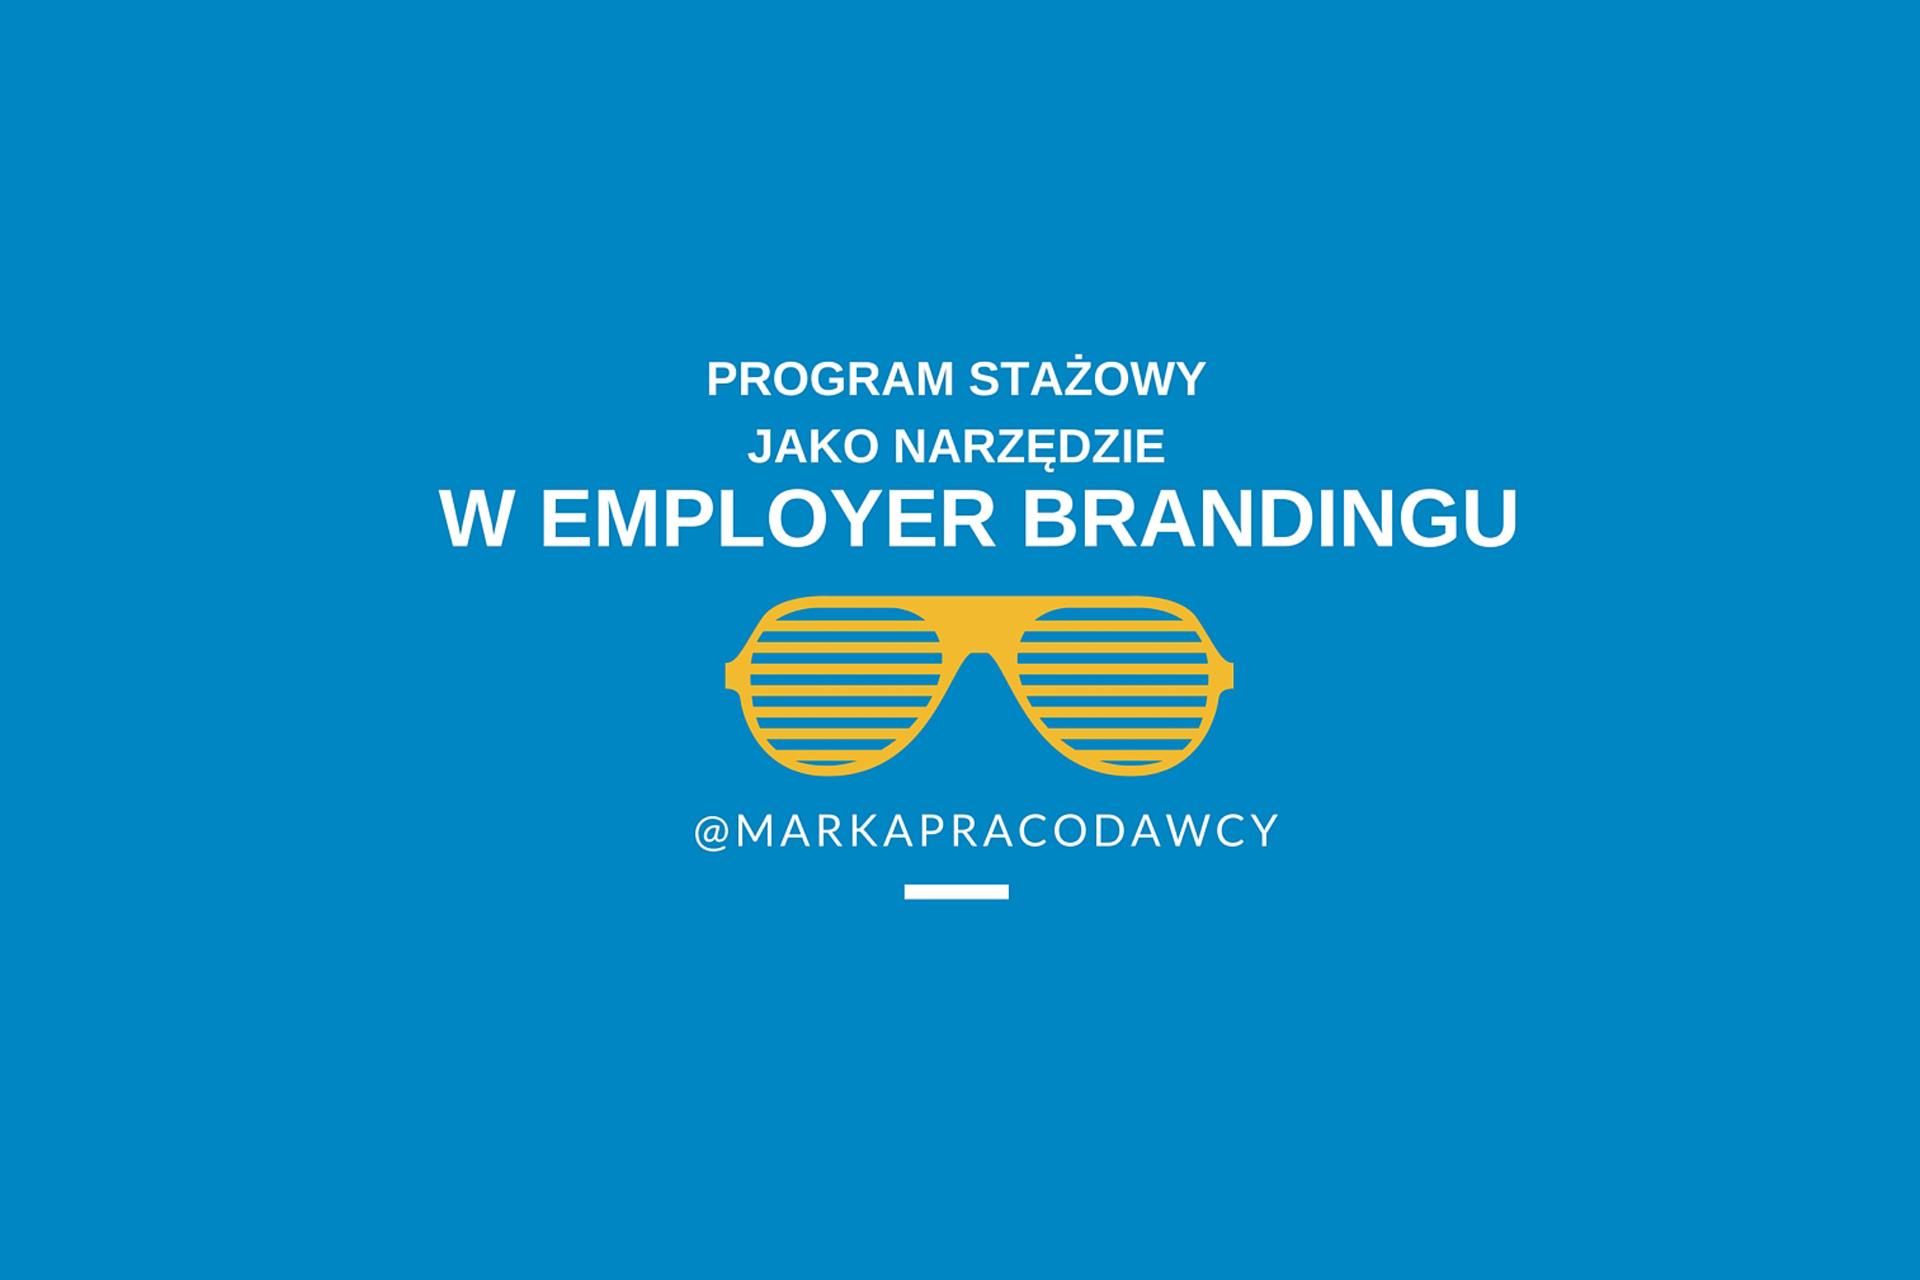 staż program a employer branding